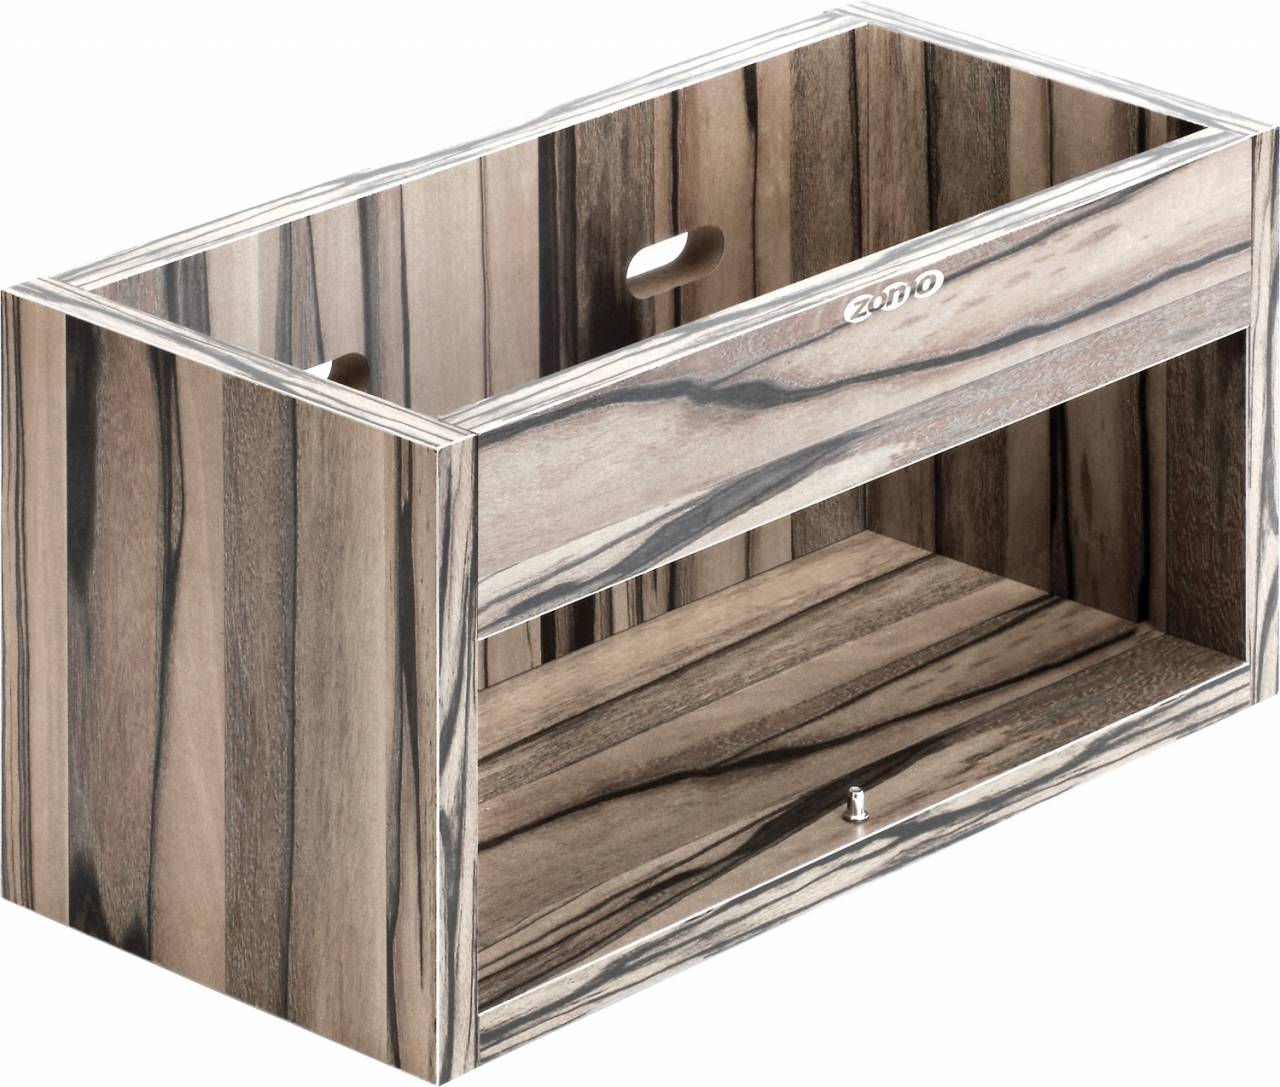 Zomo VS-Box 1/45 - zebrano 0030103149